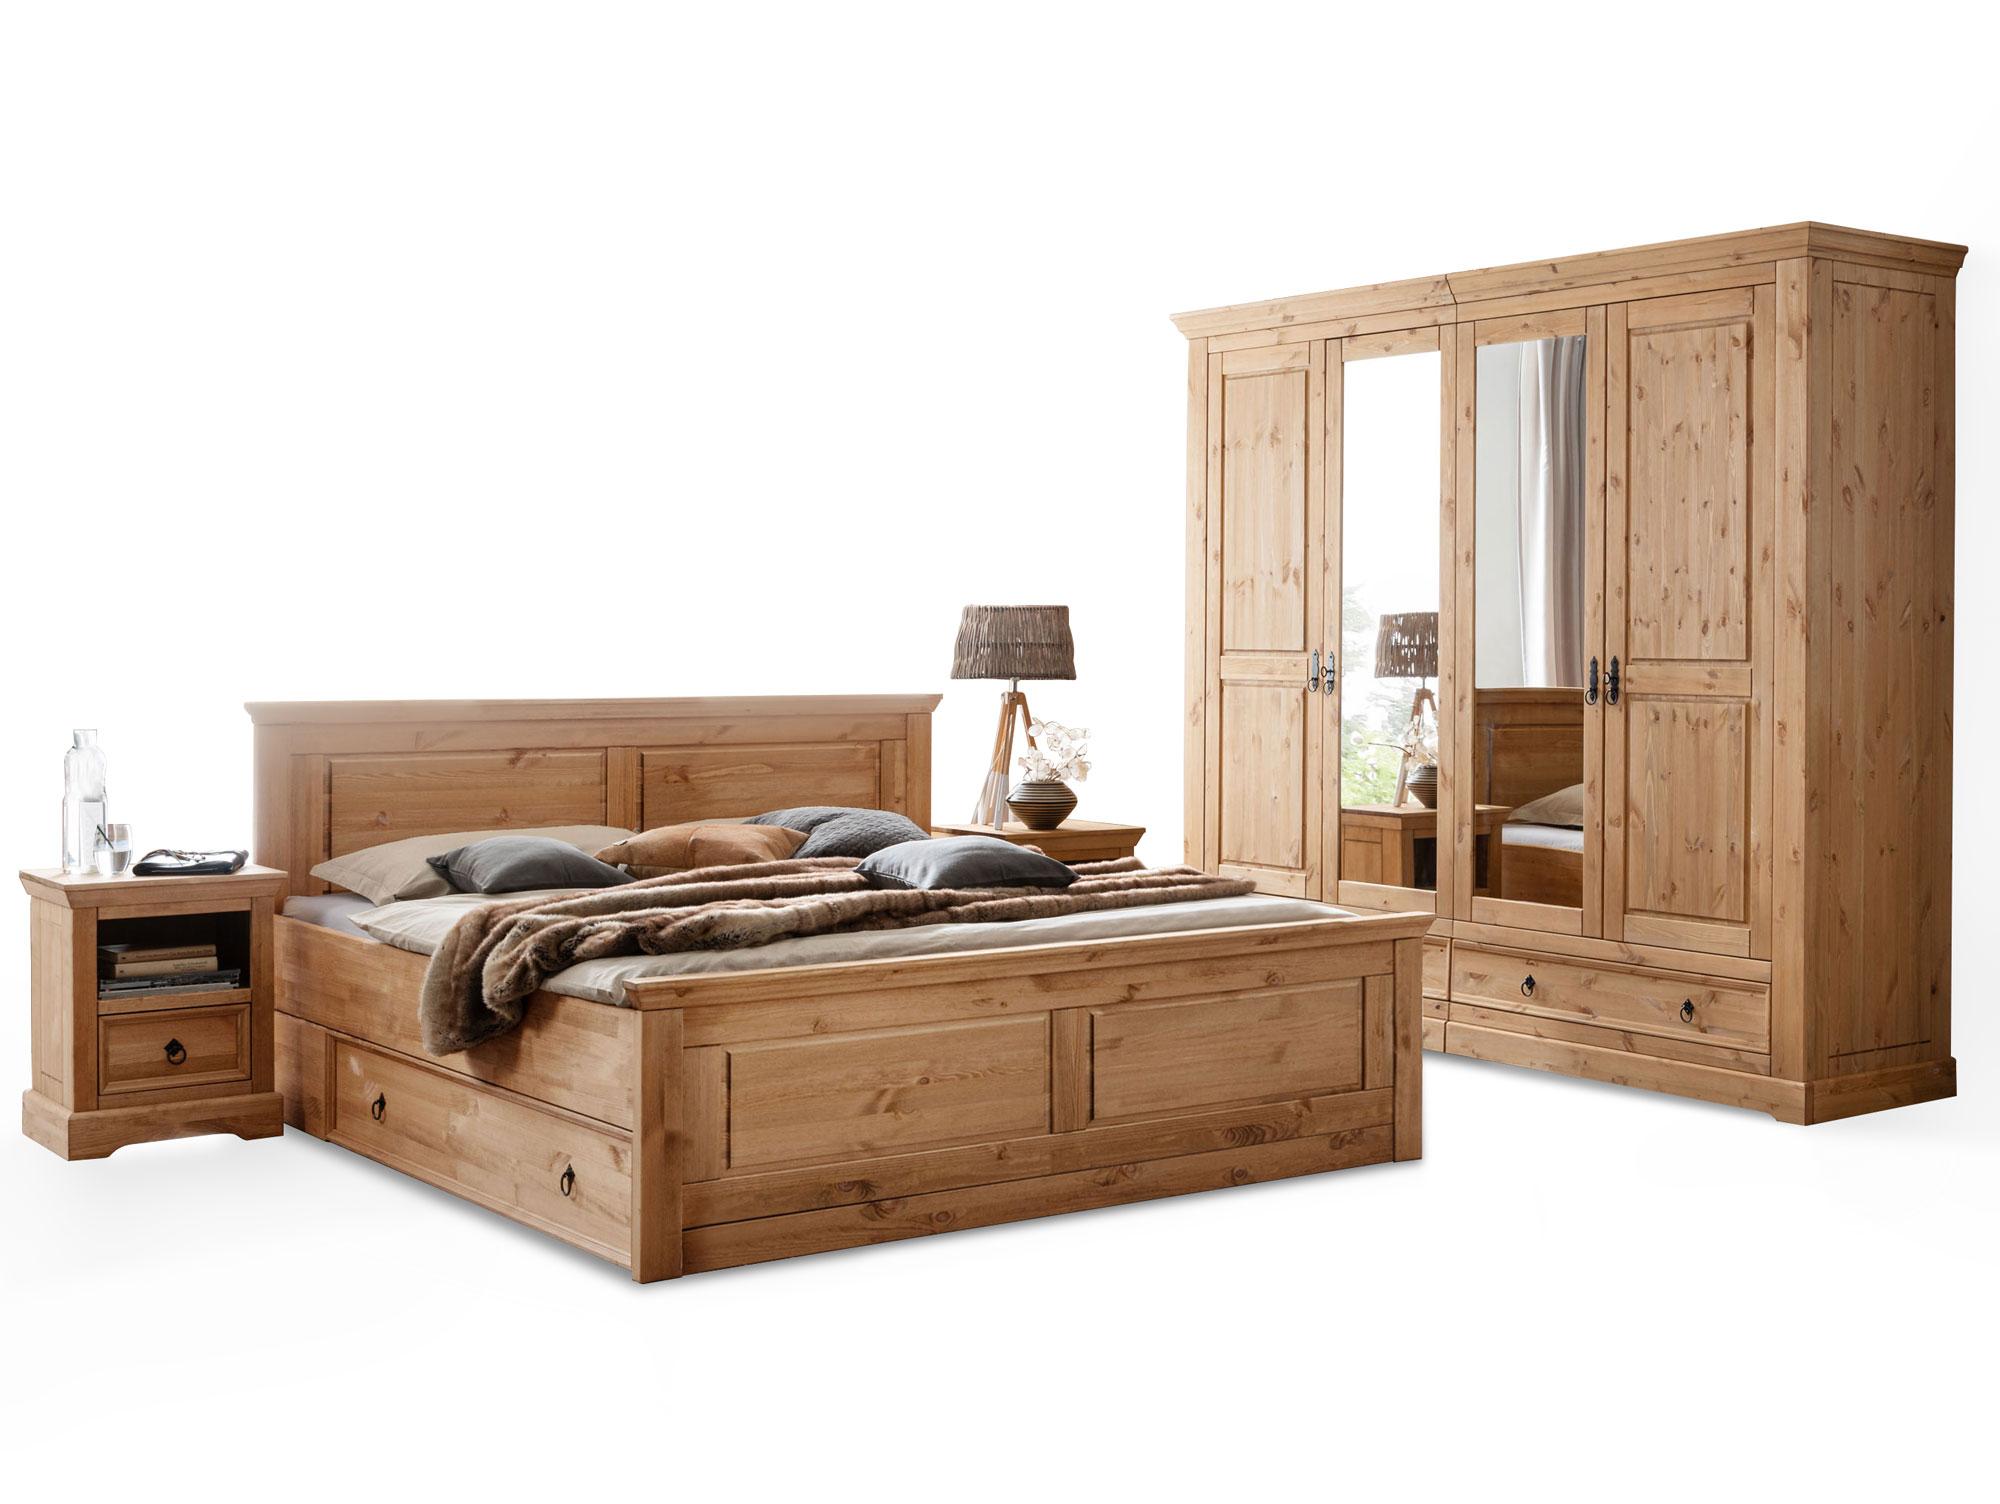 PALERMO Komplett Schlafzimmer, Material Massivholz, Kiefer ...